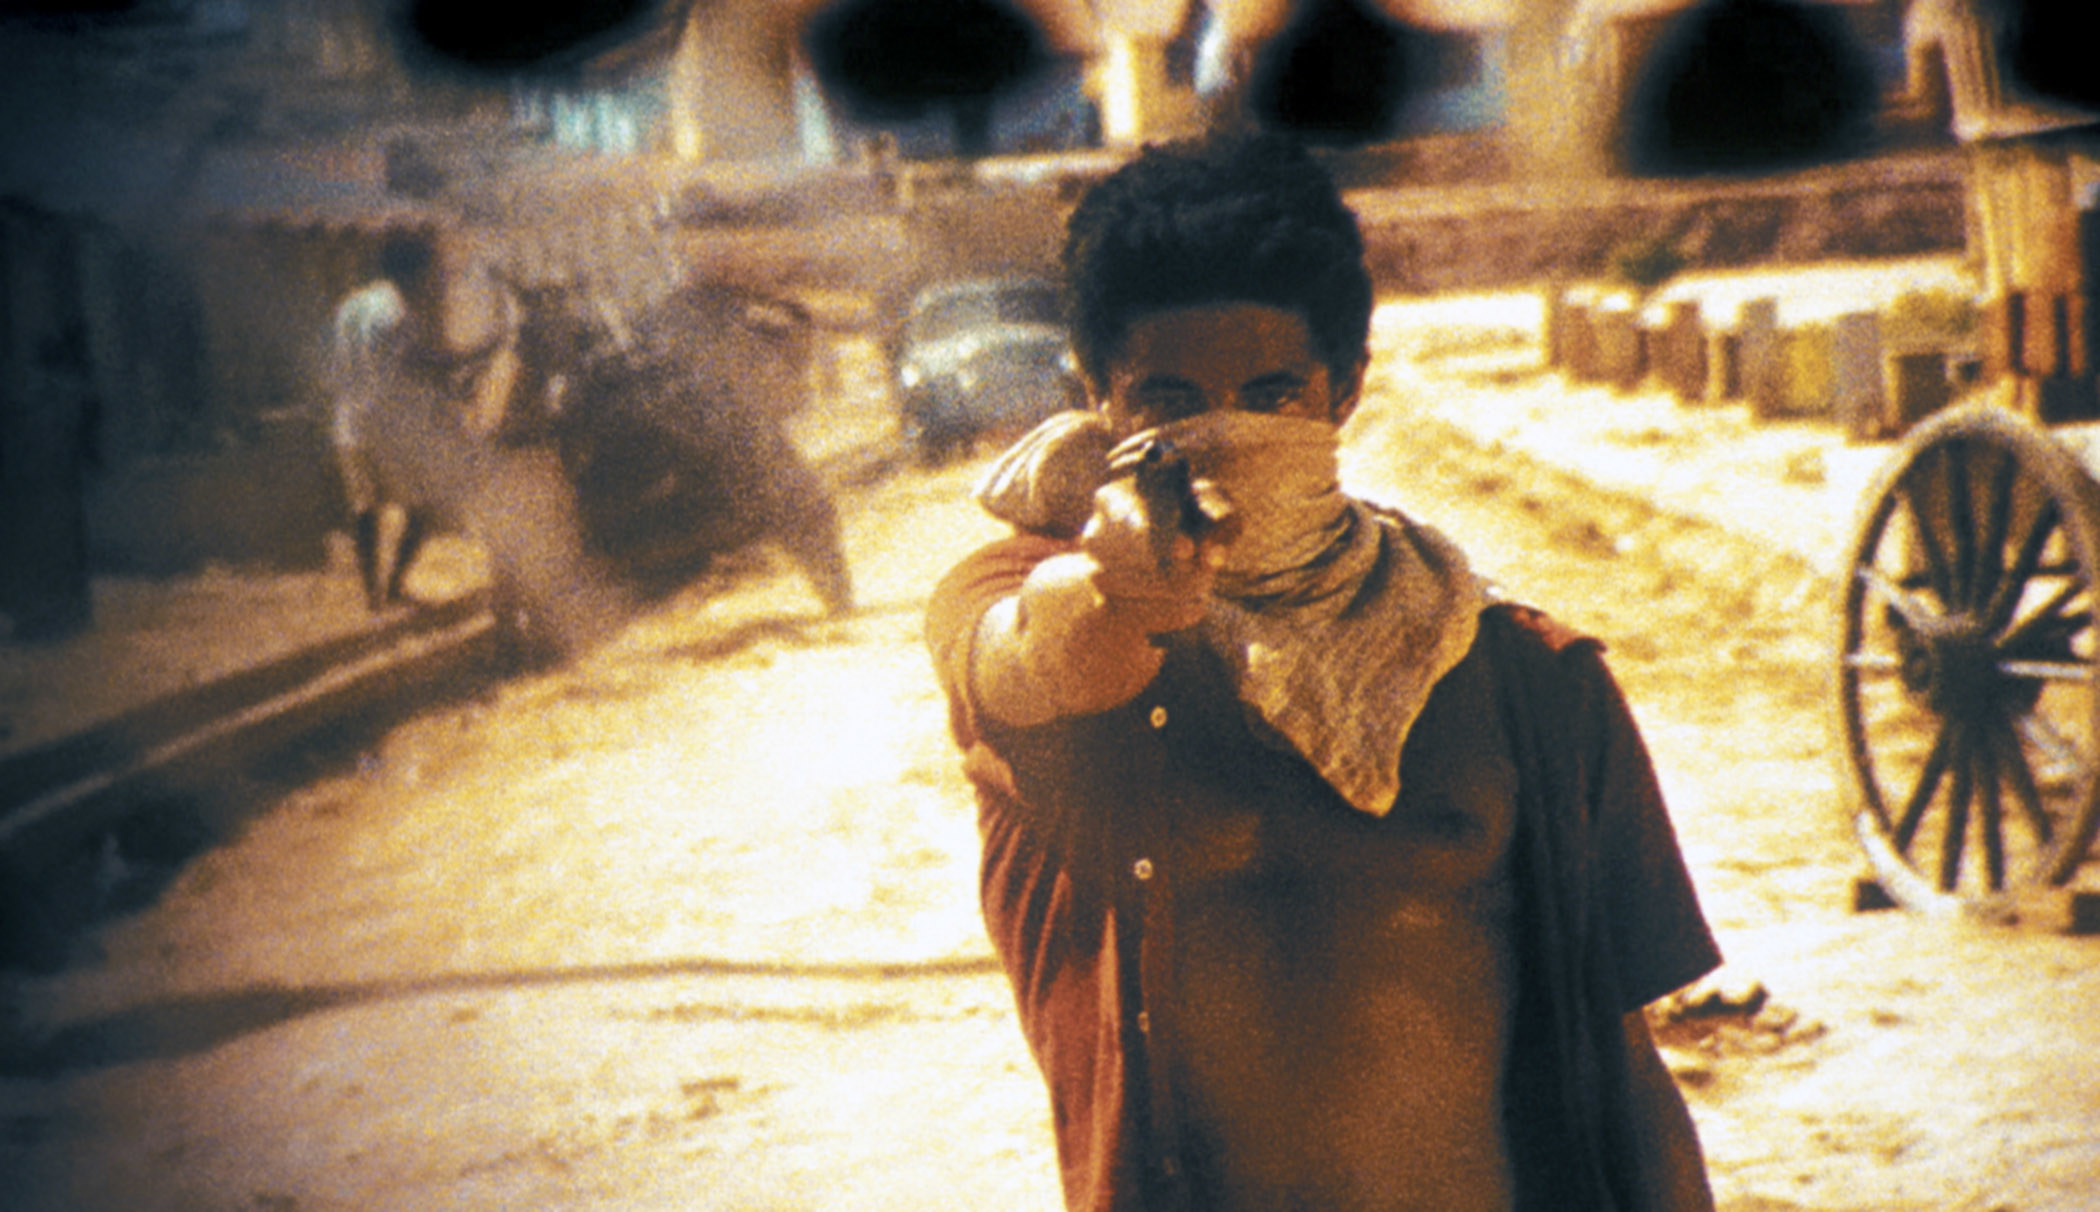 A young boy pointing a gun at the camera